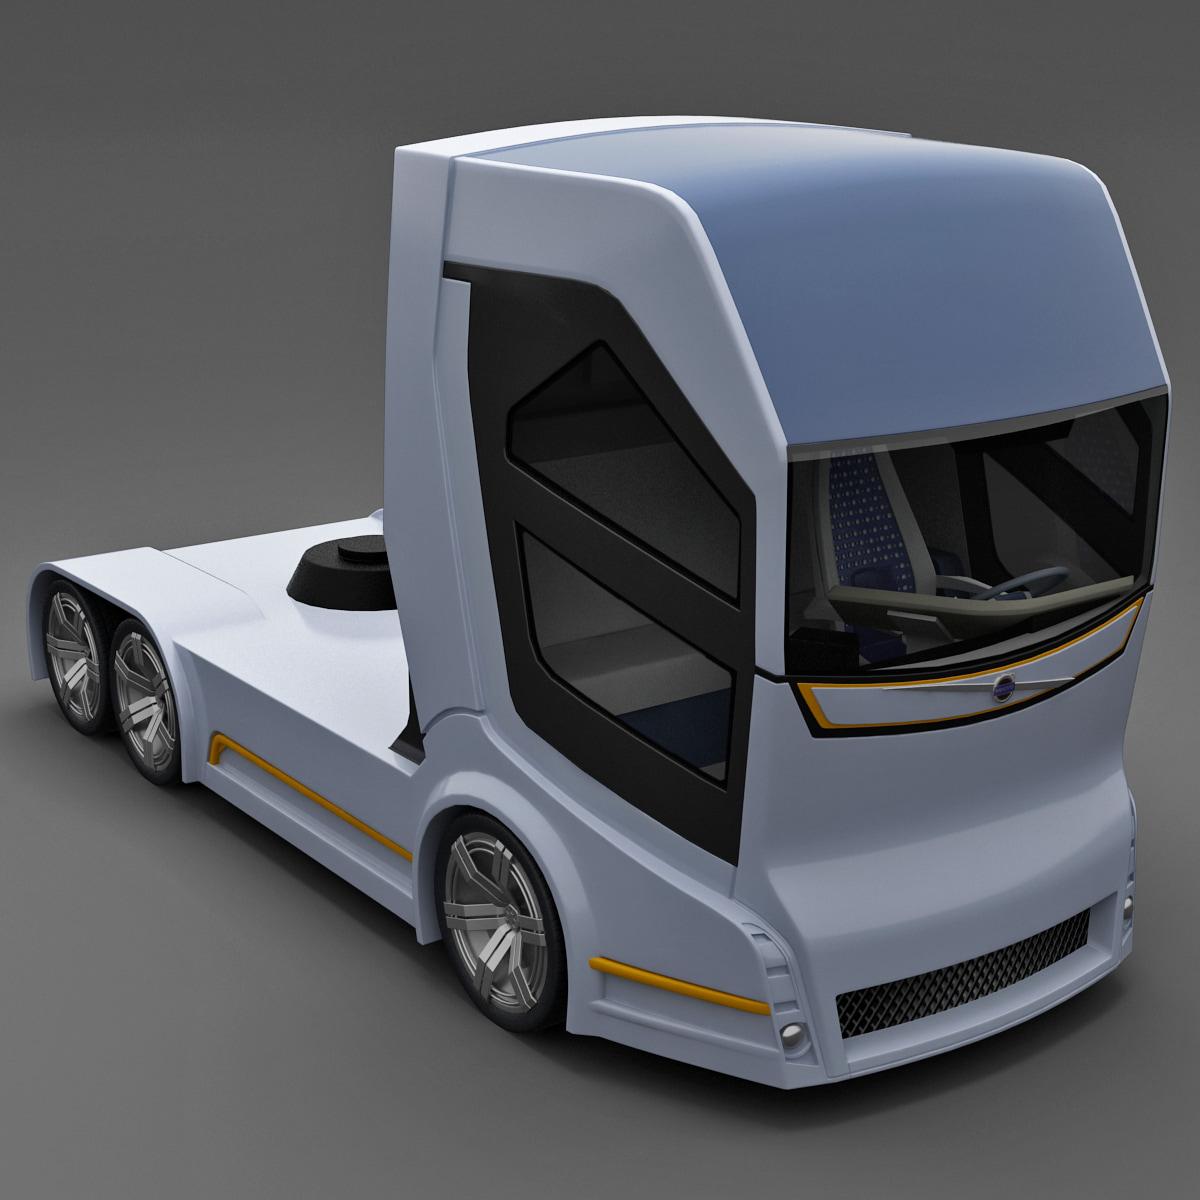 Volvo_Vision_2020_max_0001.jpg